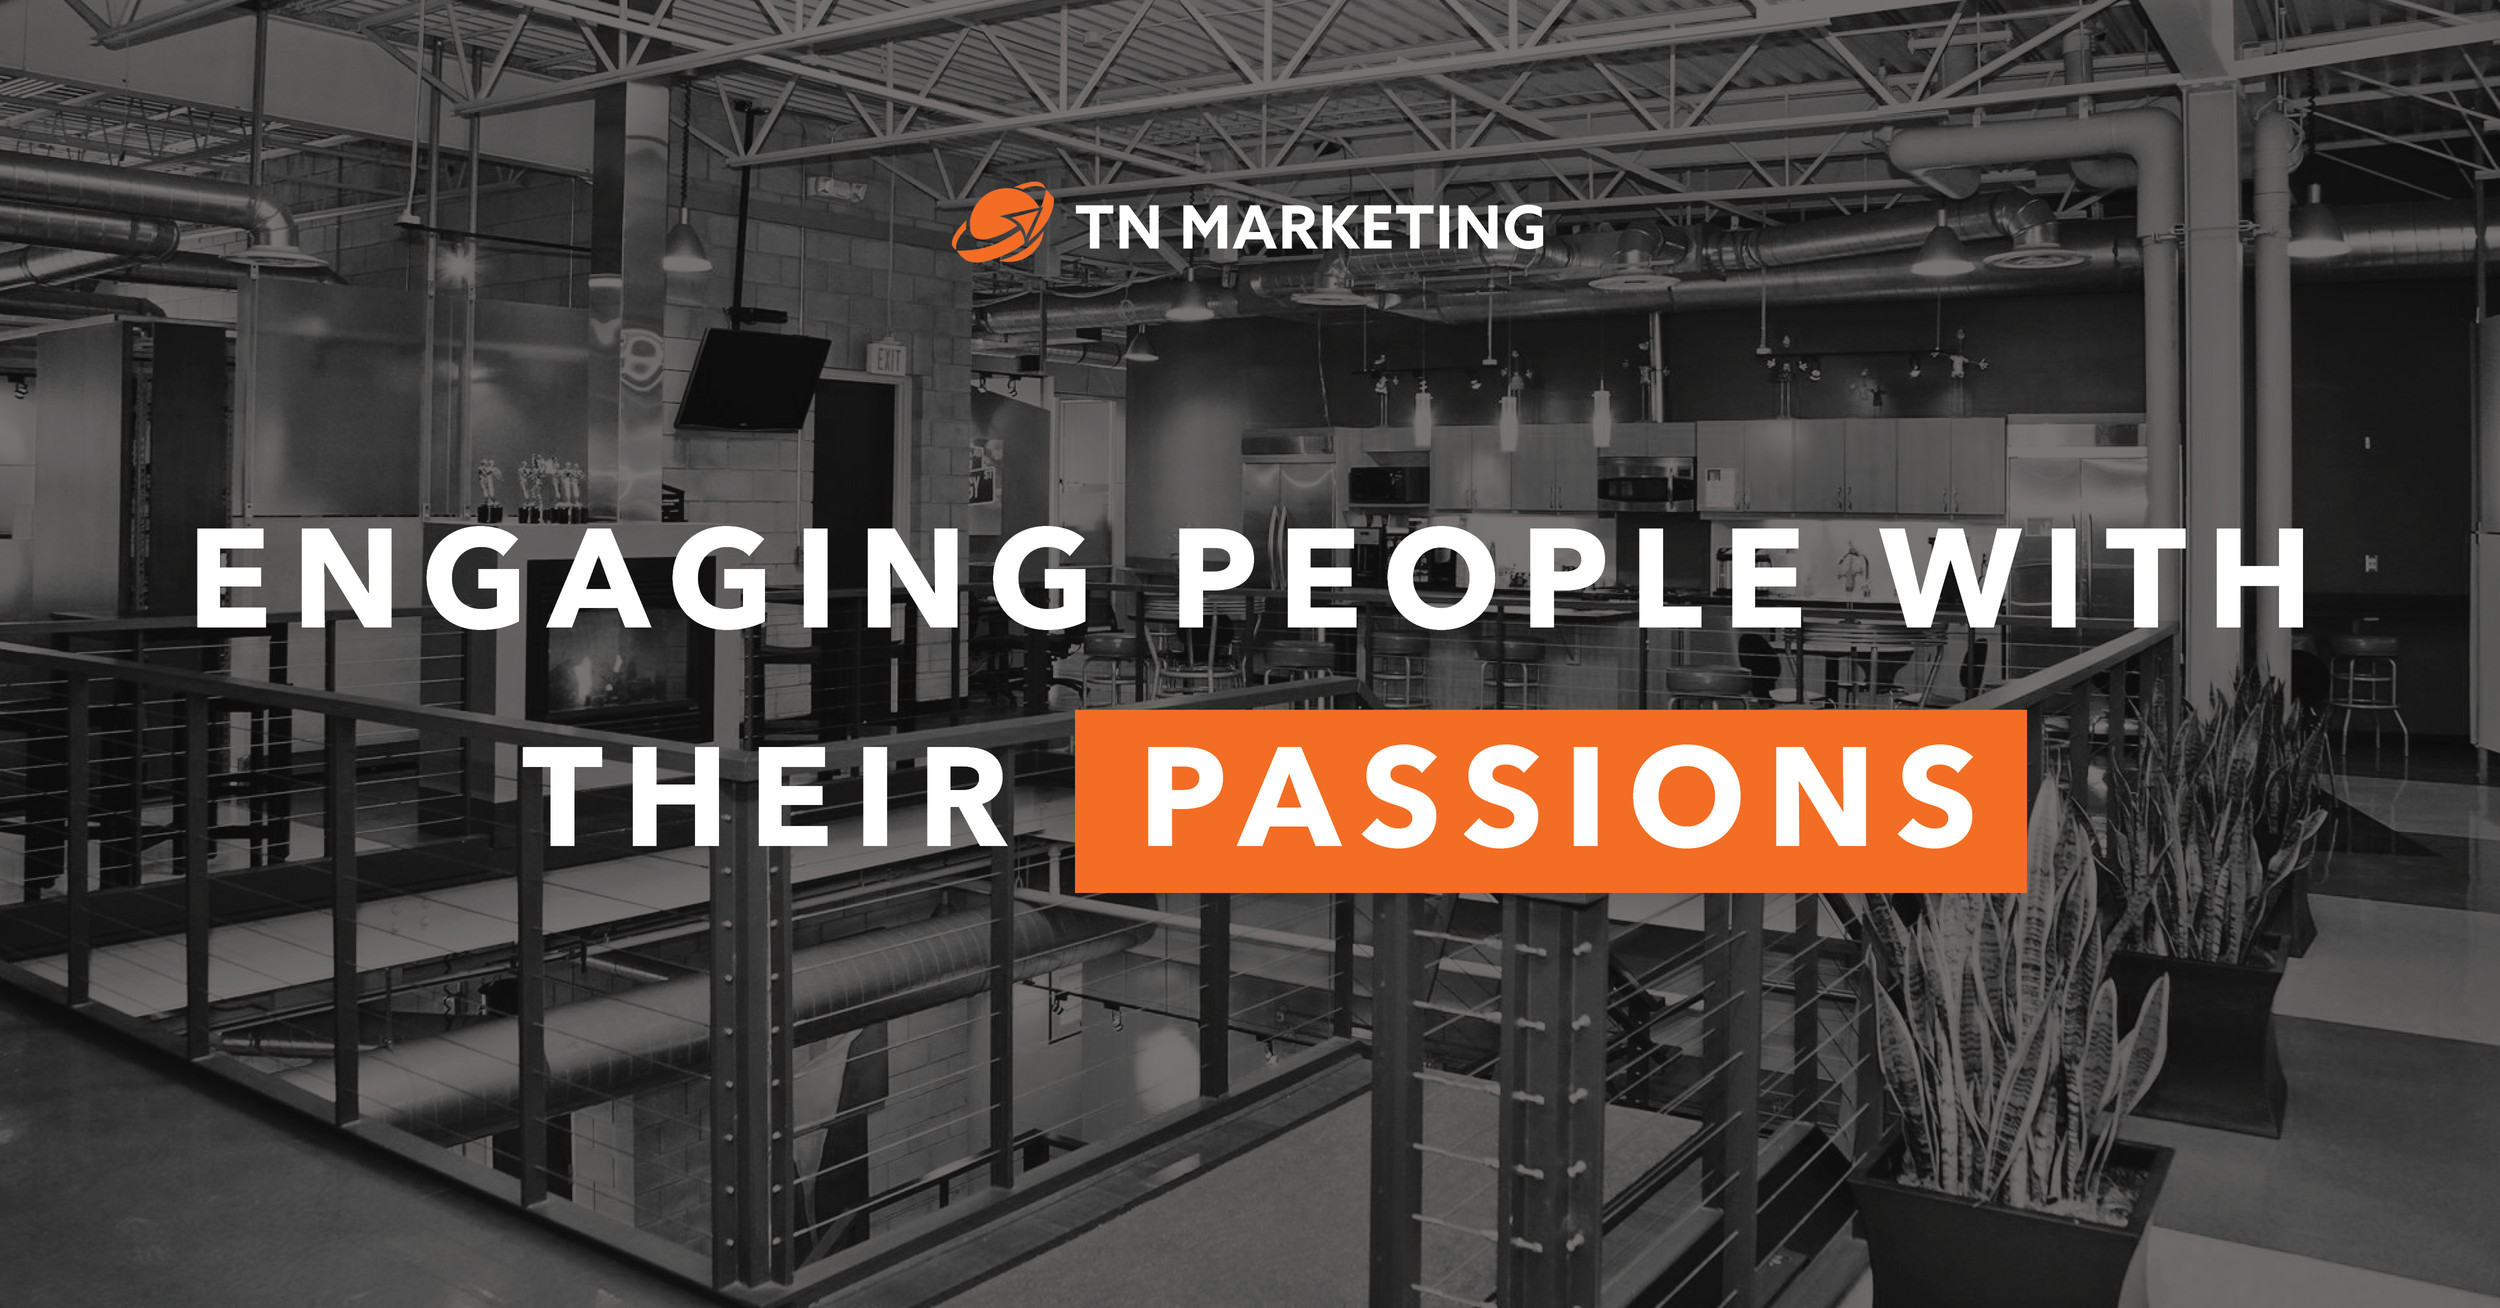 Our Communities Tn Marketing